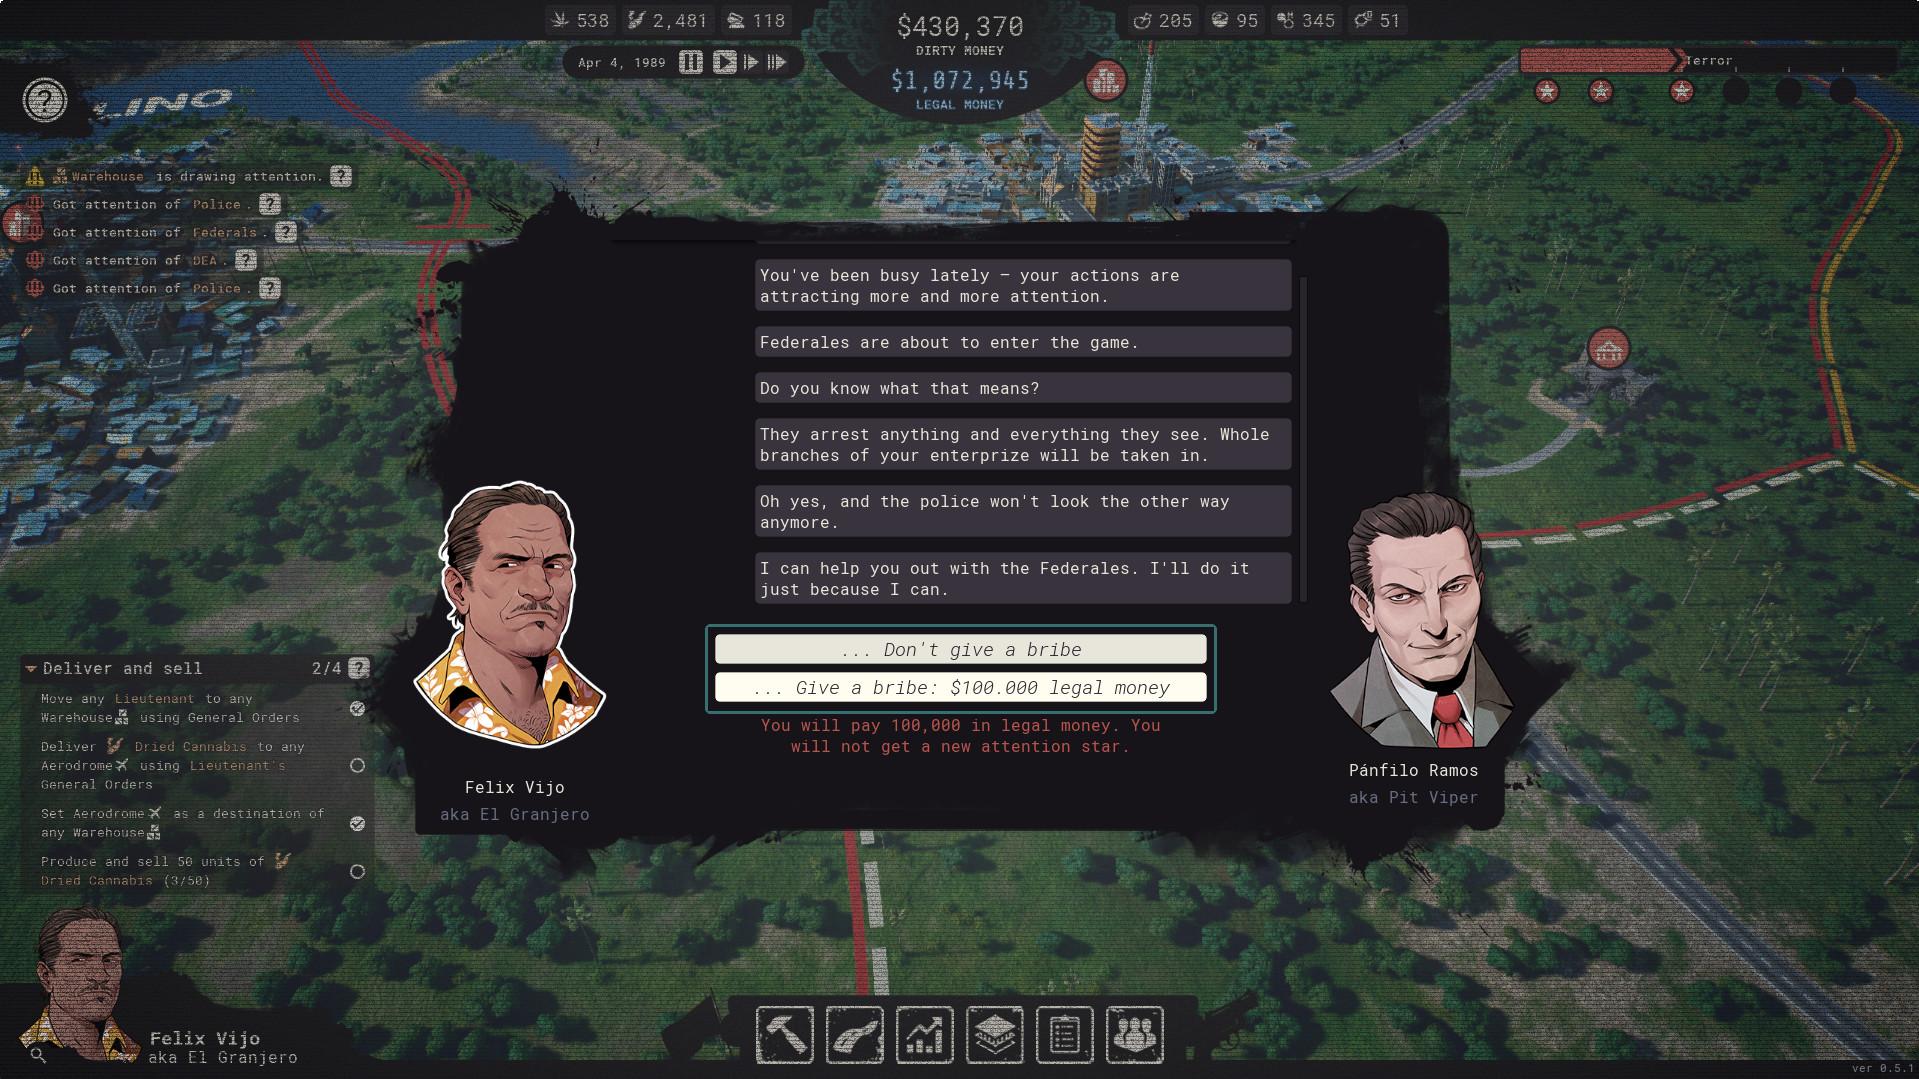 Cartel Tycoon screenshot 2